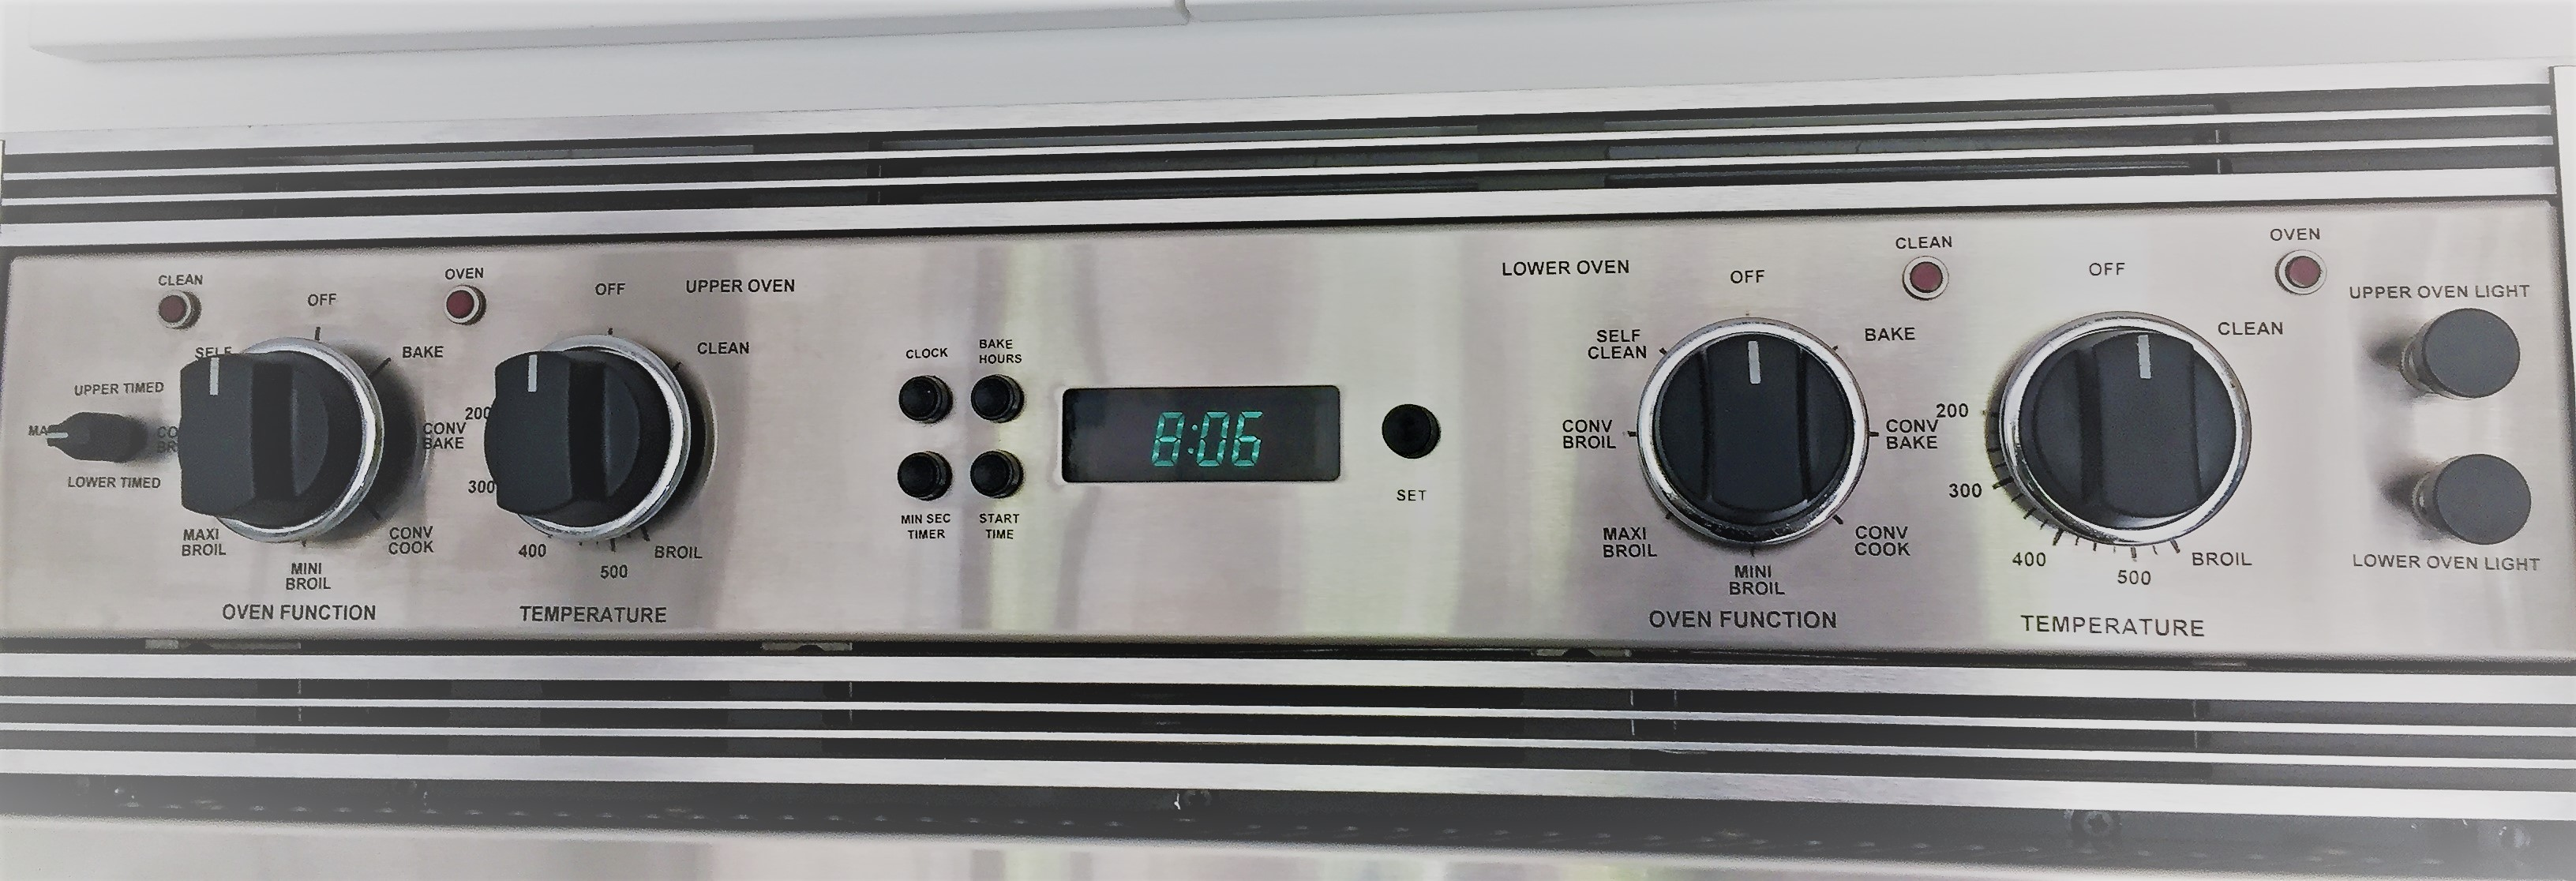 diagram refrigerator viking wiring vcsb483dbk allvikingparts com vikingdecals com  allvikingparts com vikingdecals com